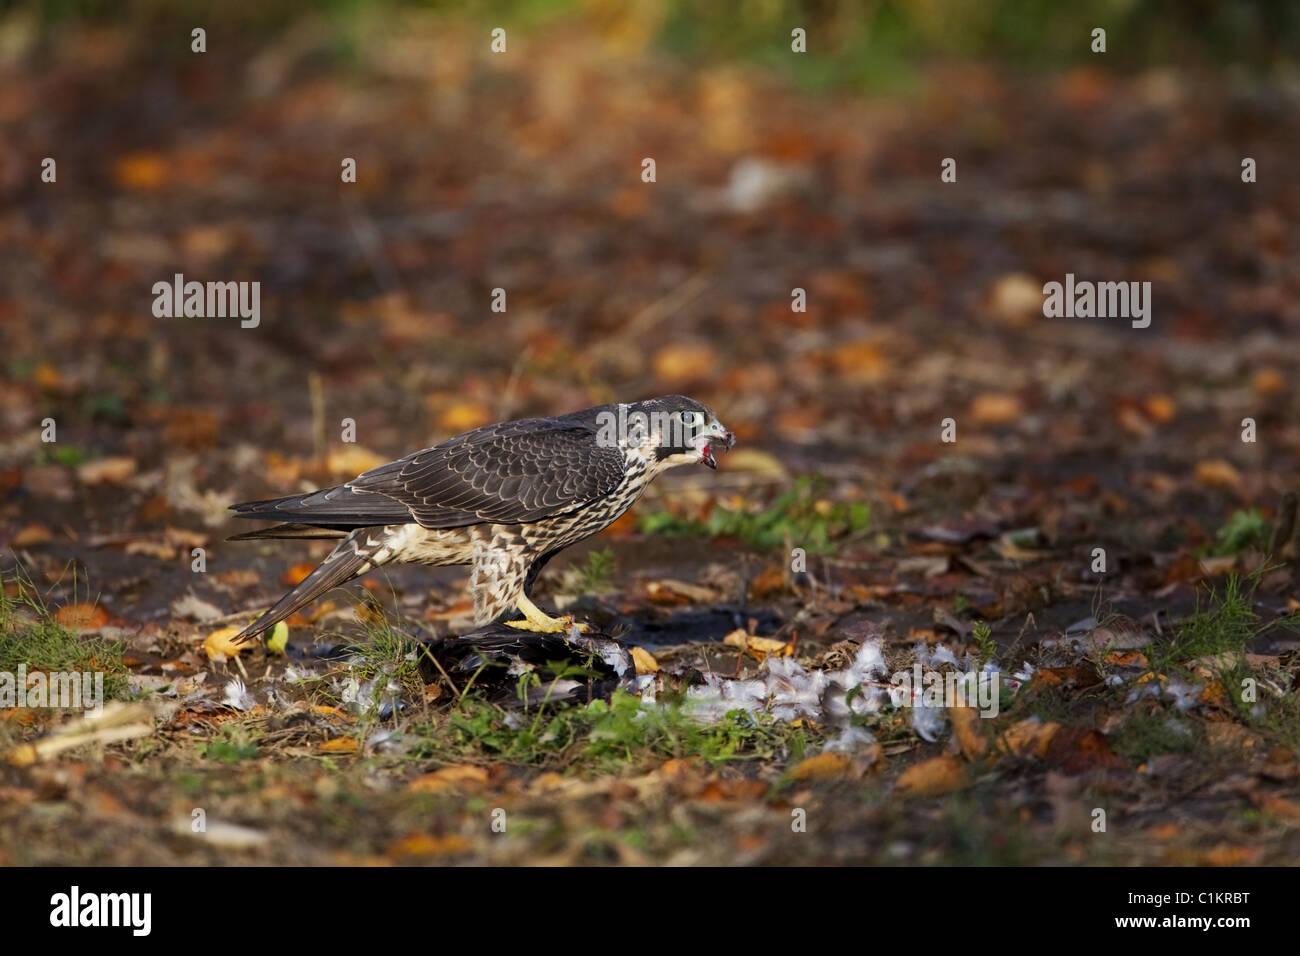 Peregrine Falcon eating prey - Stock Image